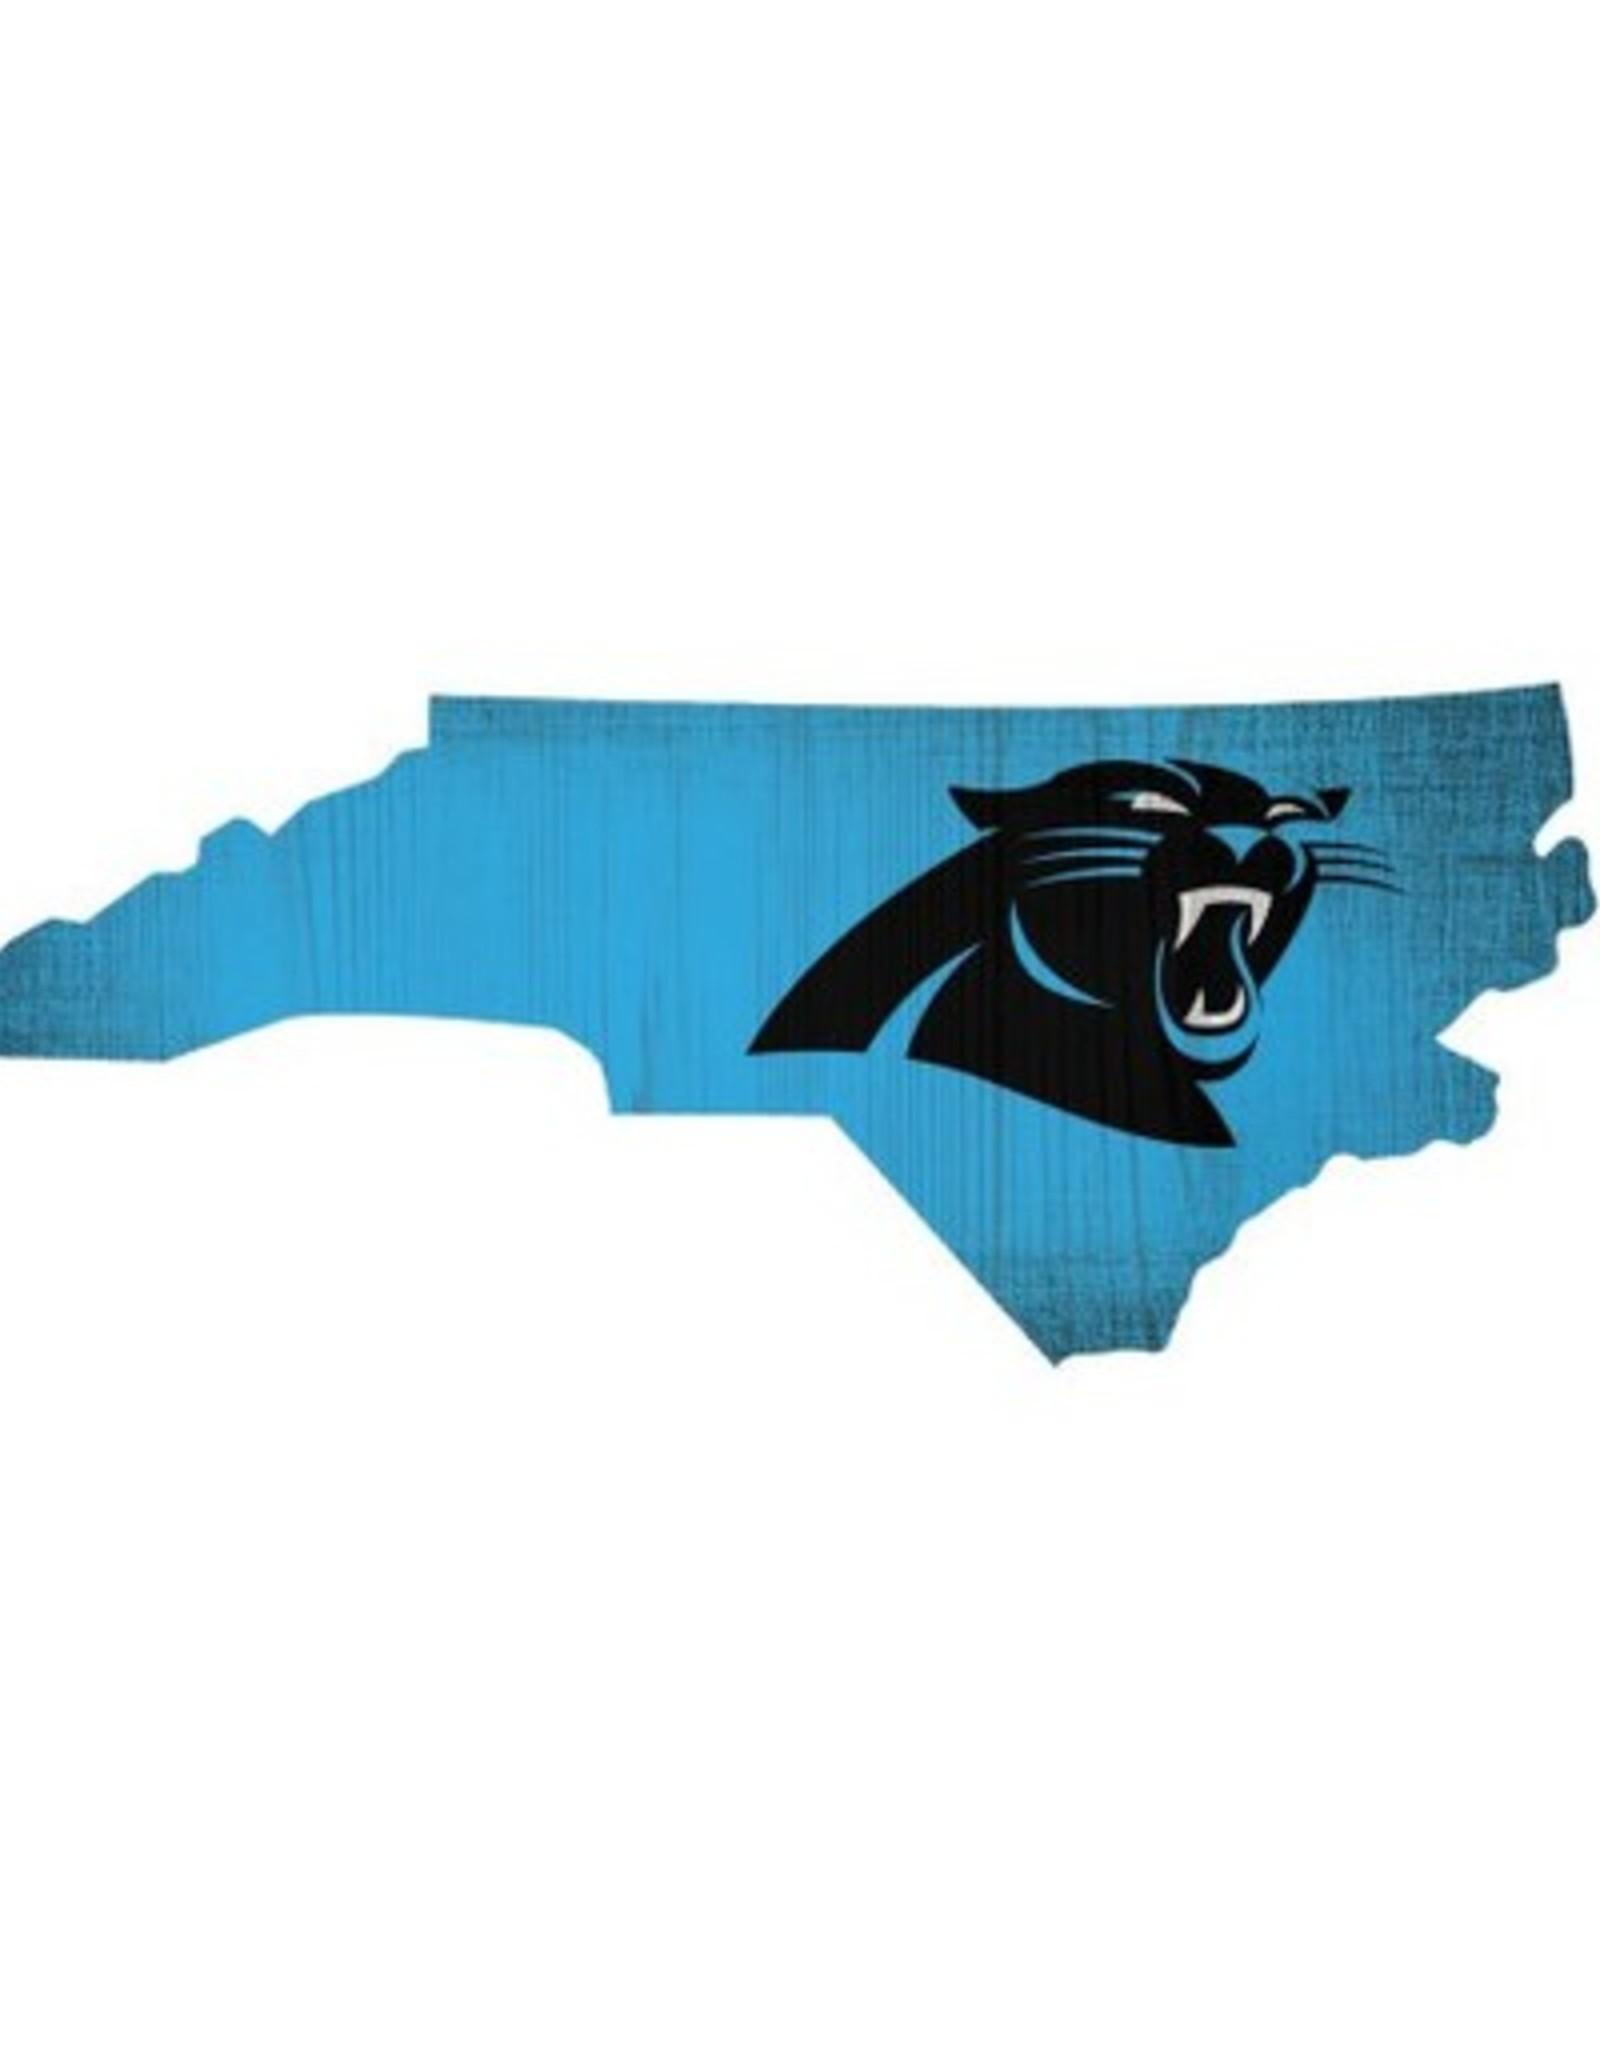 FAN CREATIONS Carolina Panthers Team Logo State Sign